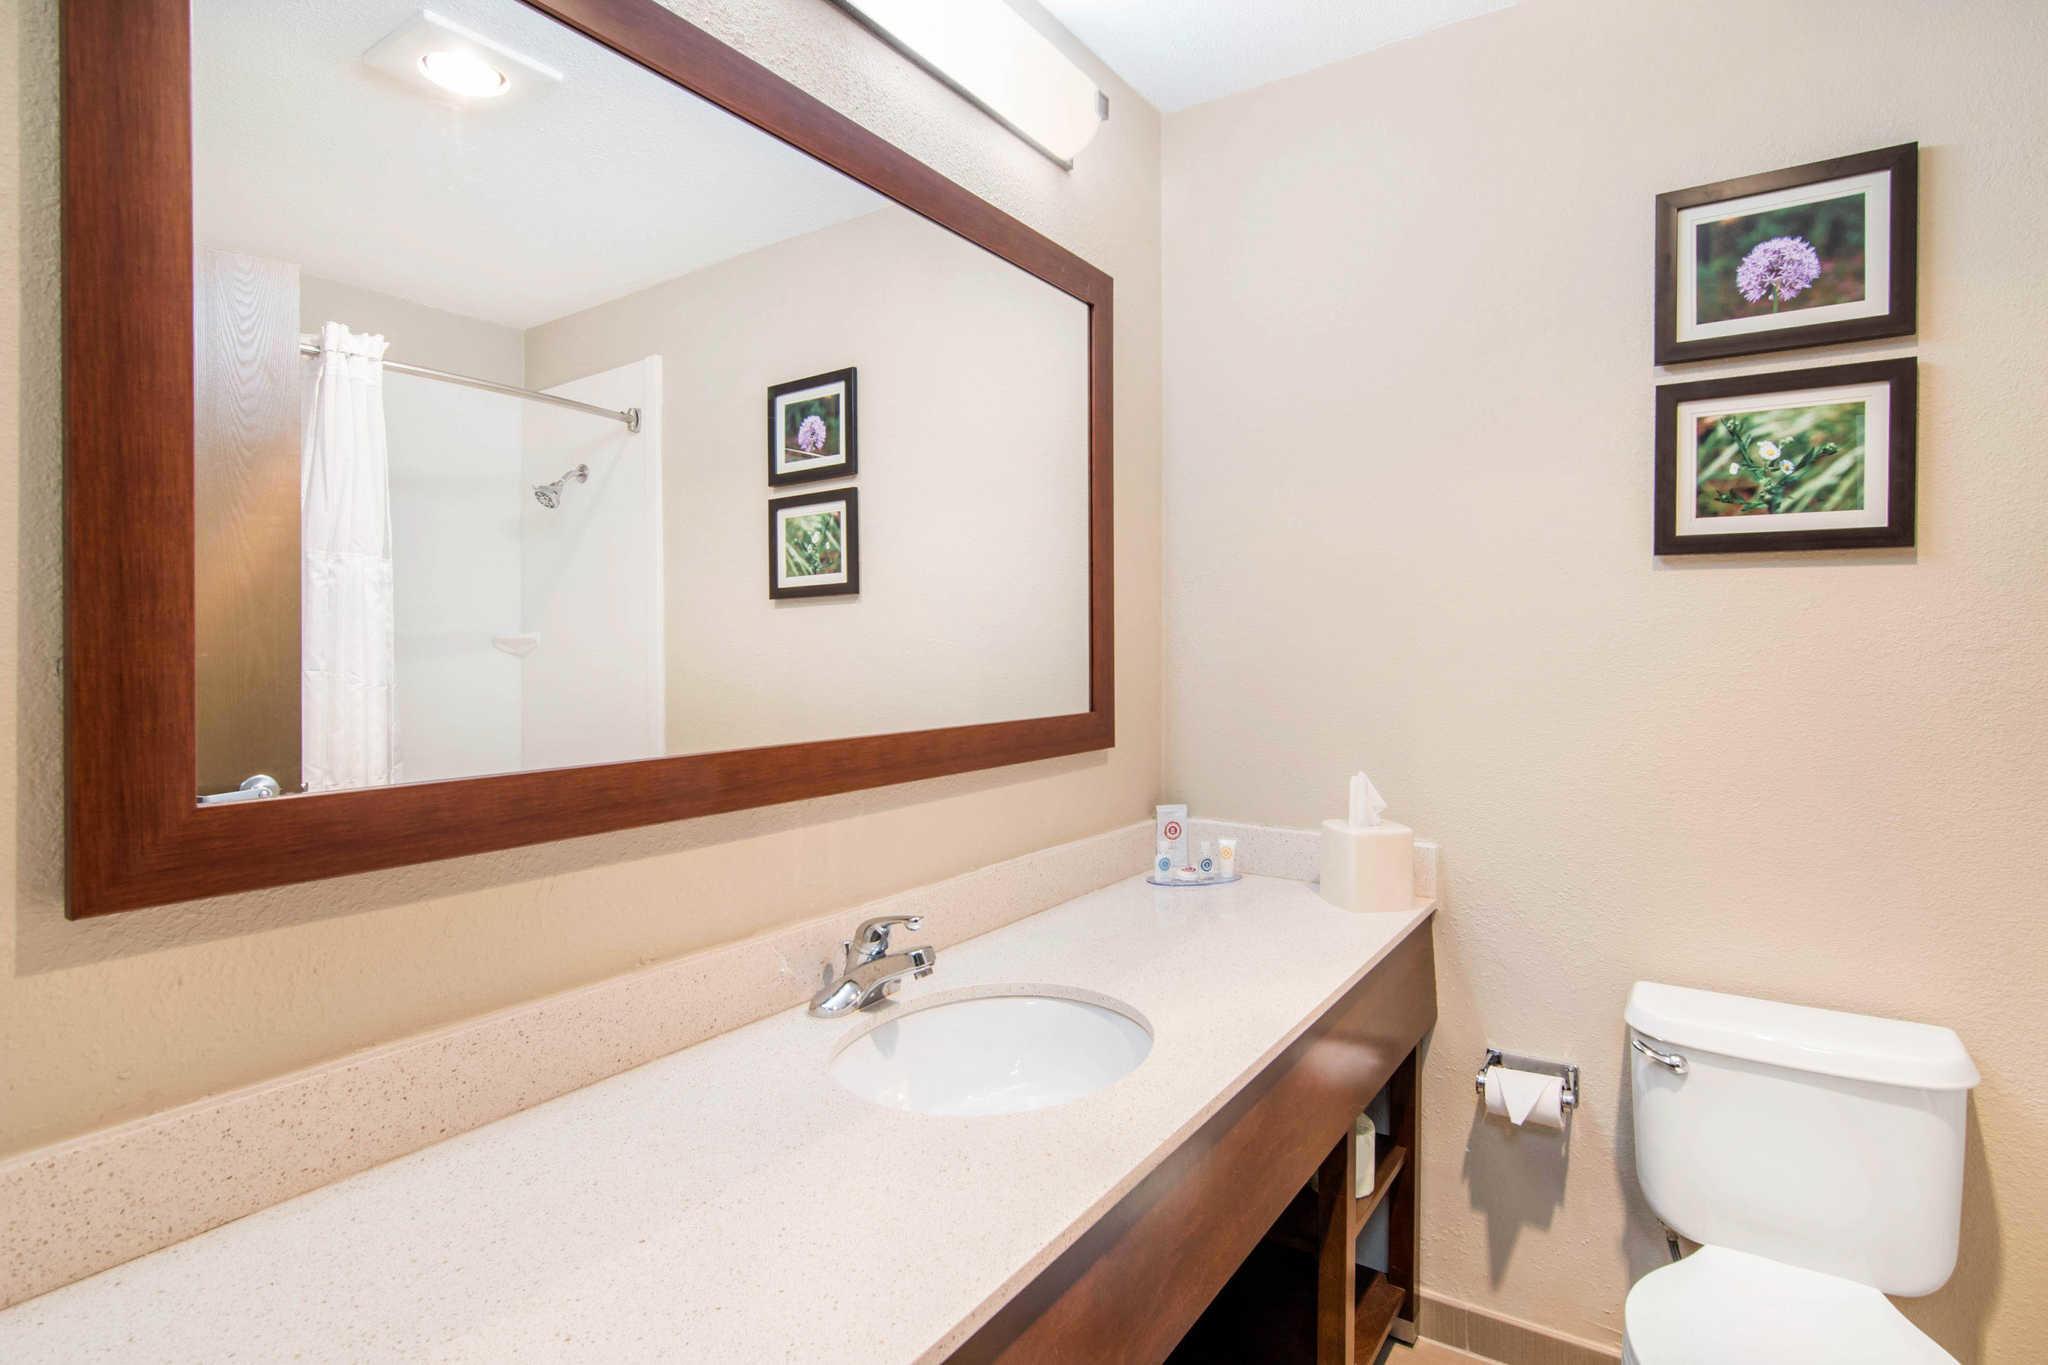 Comfort Inn & Suites Junction City - near Fort Riley image 26